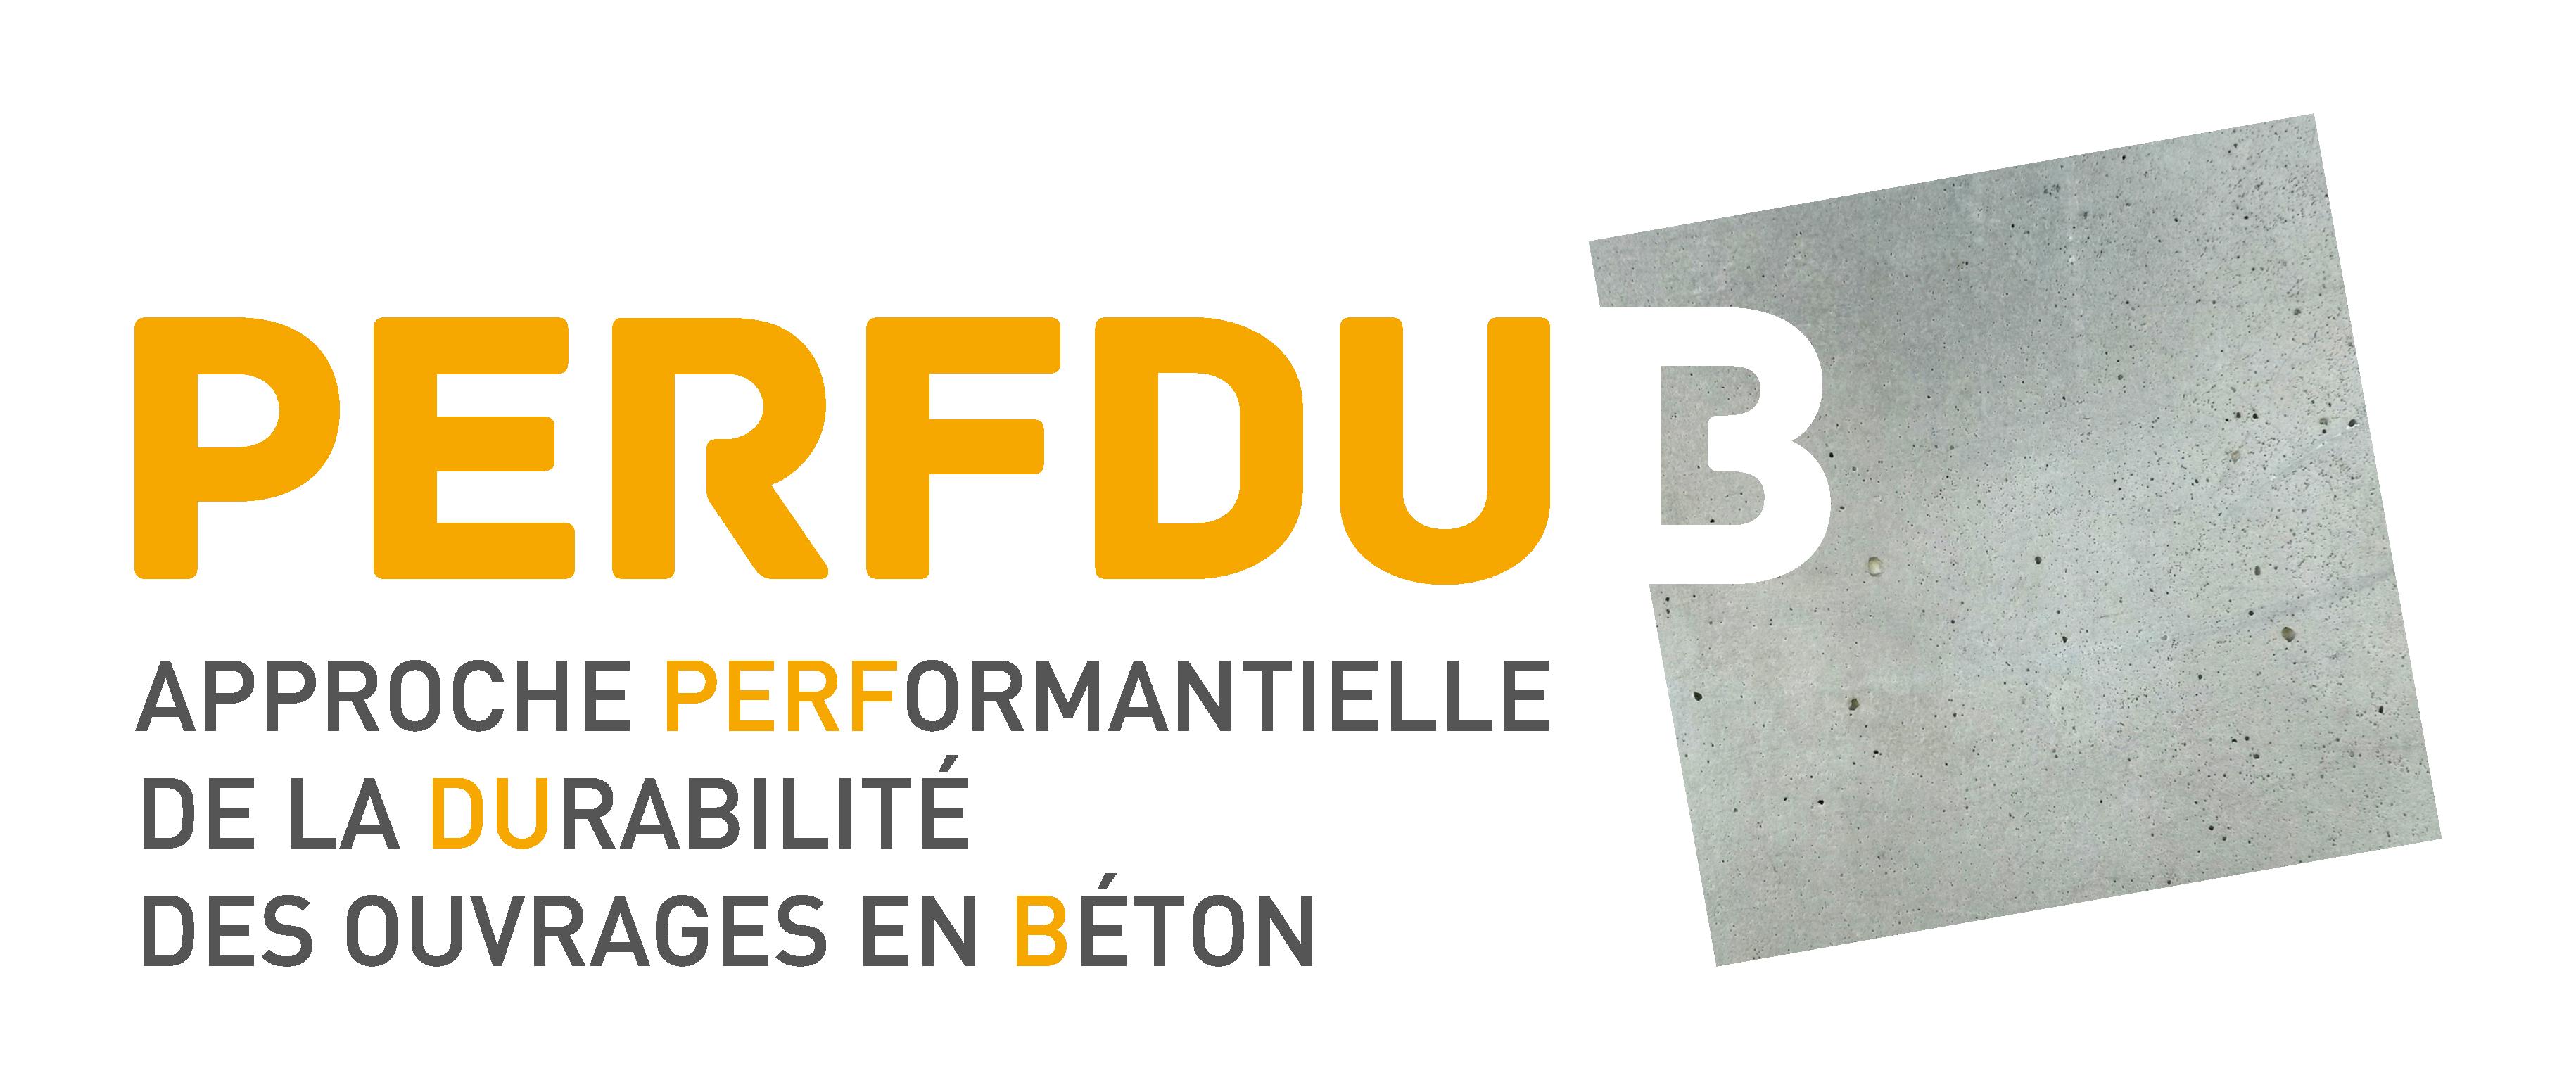 La newsletter PERFDUB de novembre 2016 est en ligne